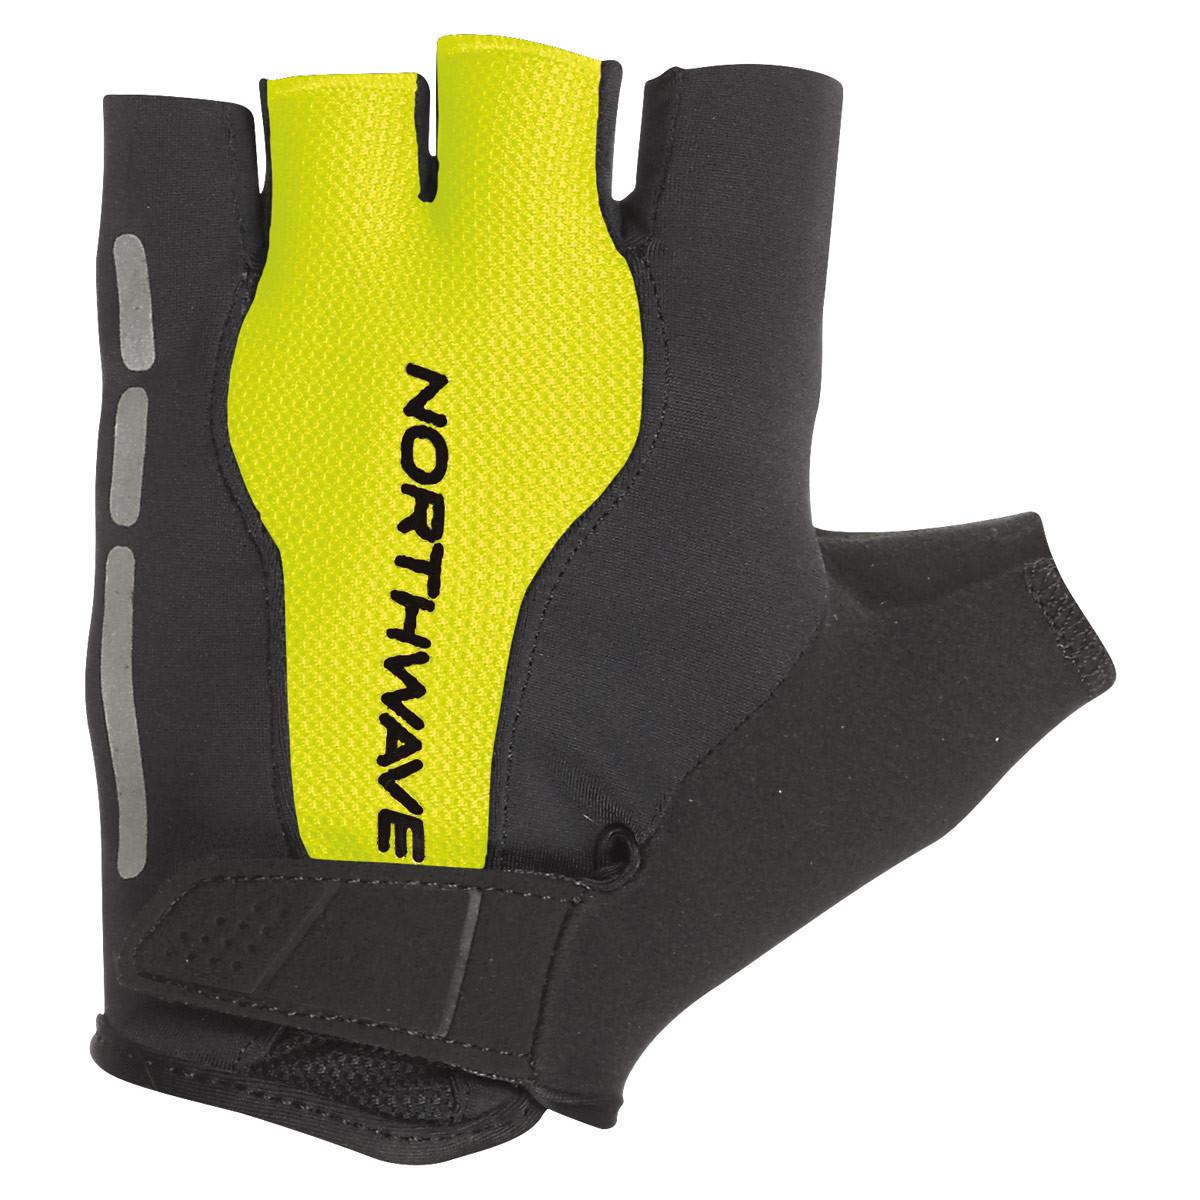 Жіночі велорукавиці Northwave Flash Short Gloves | троянд. M